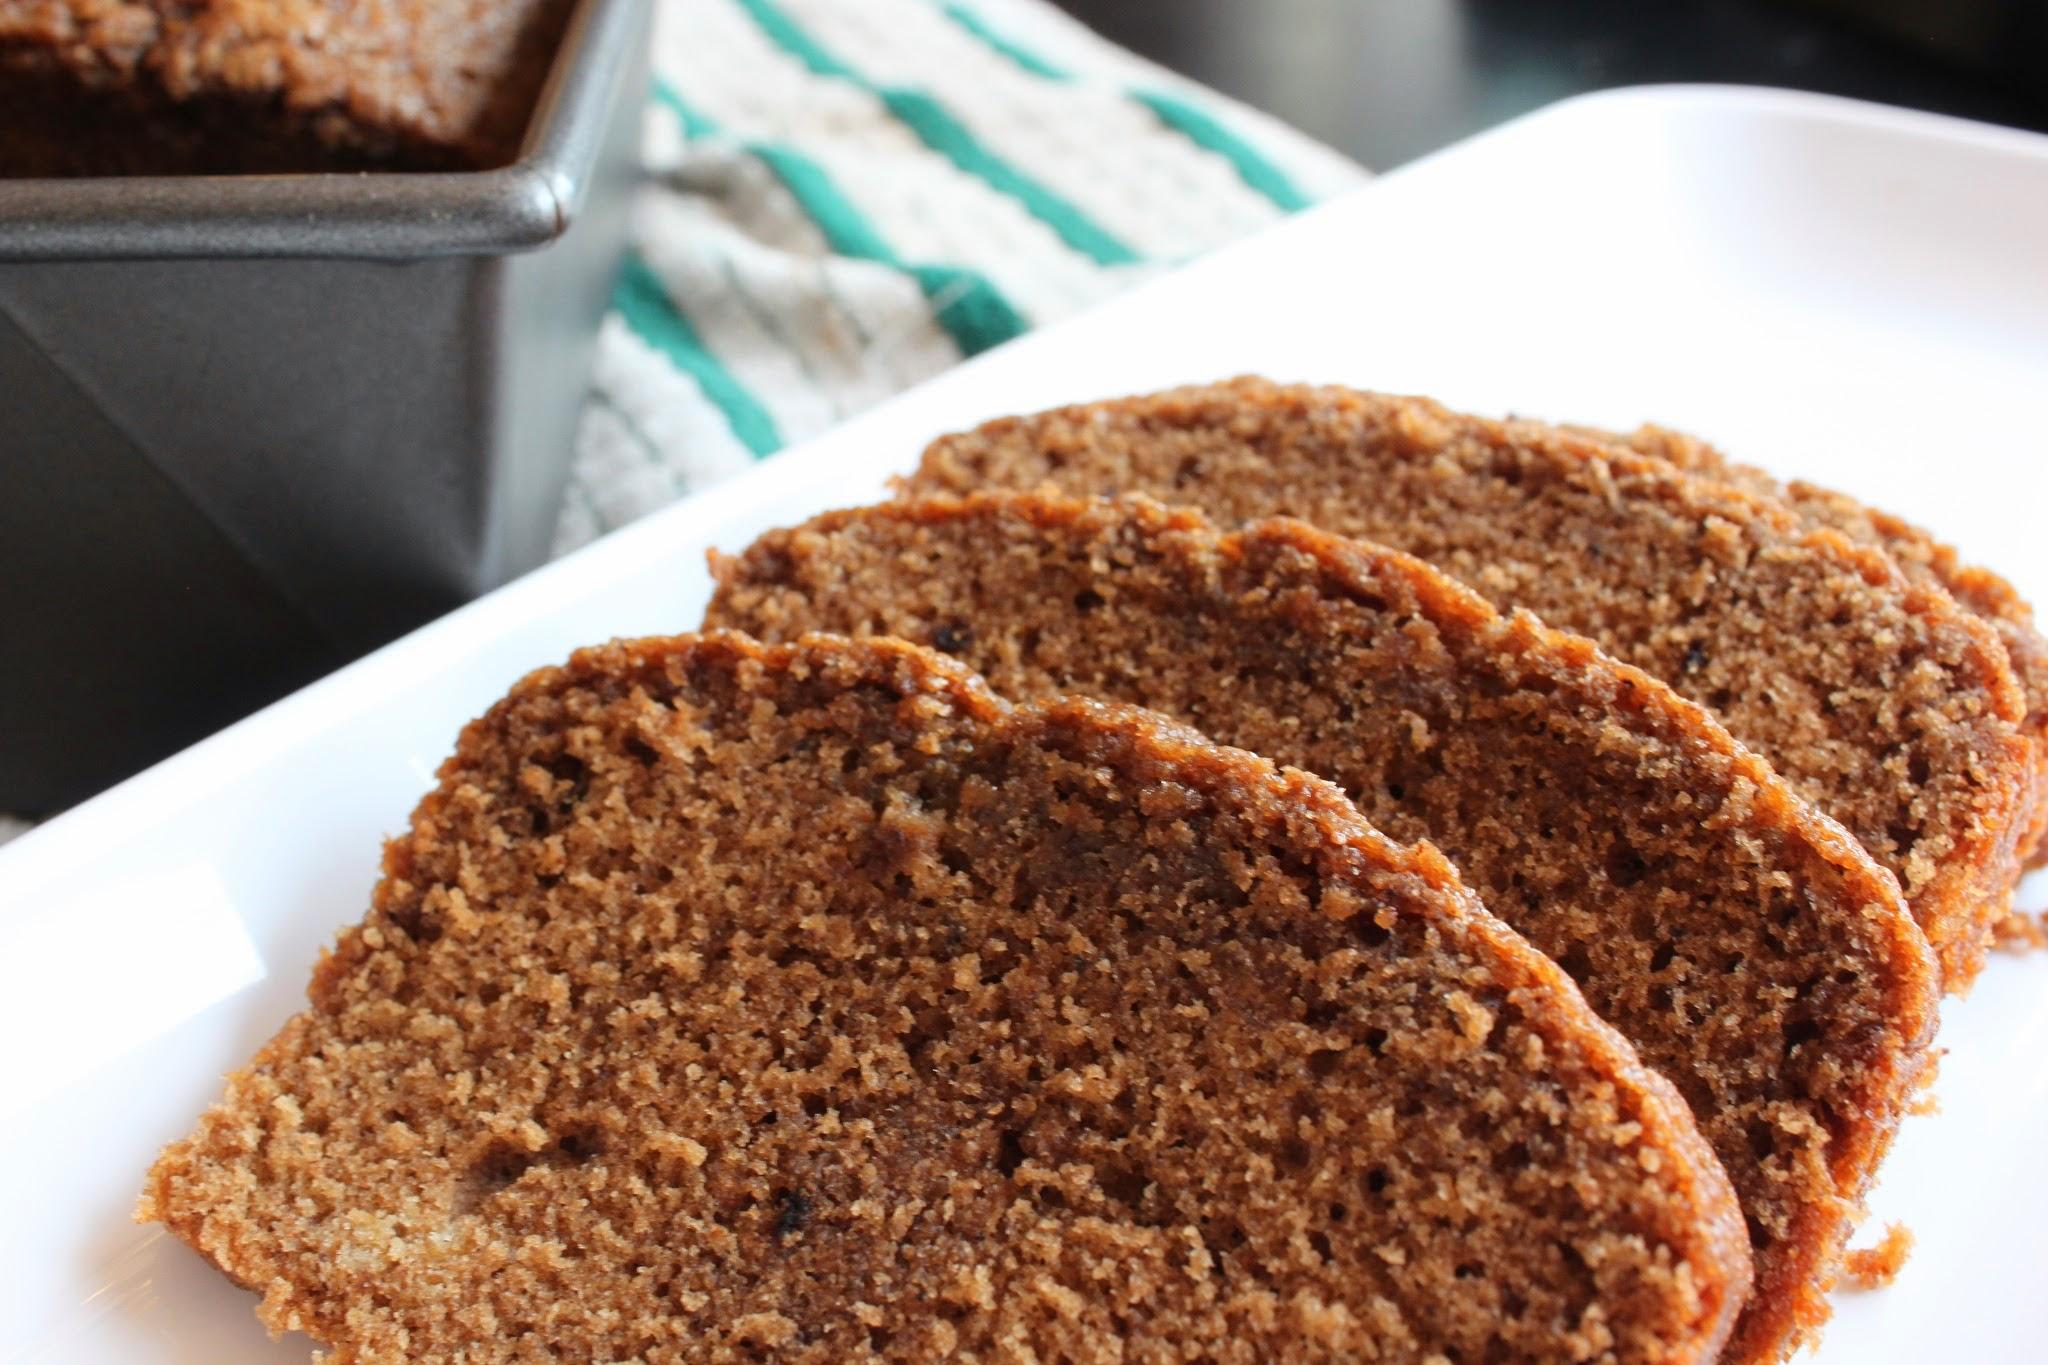 Mocha Bread